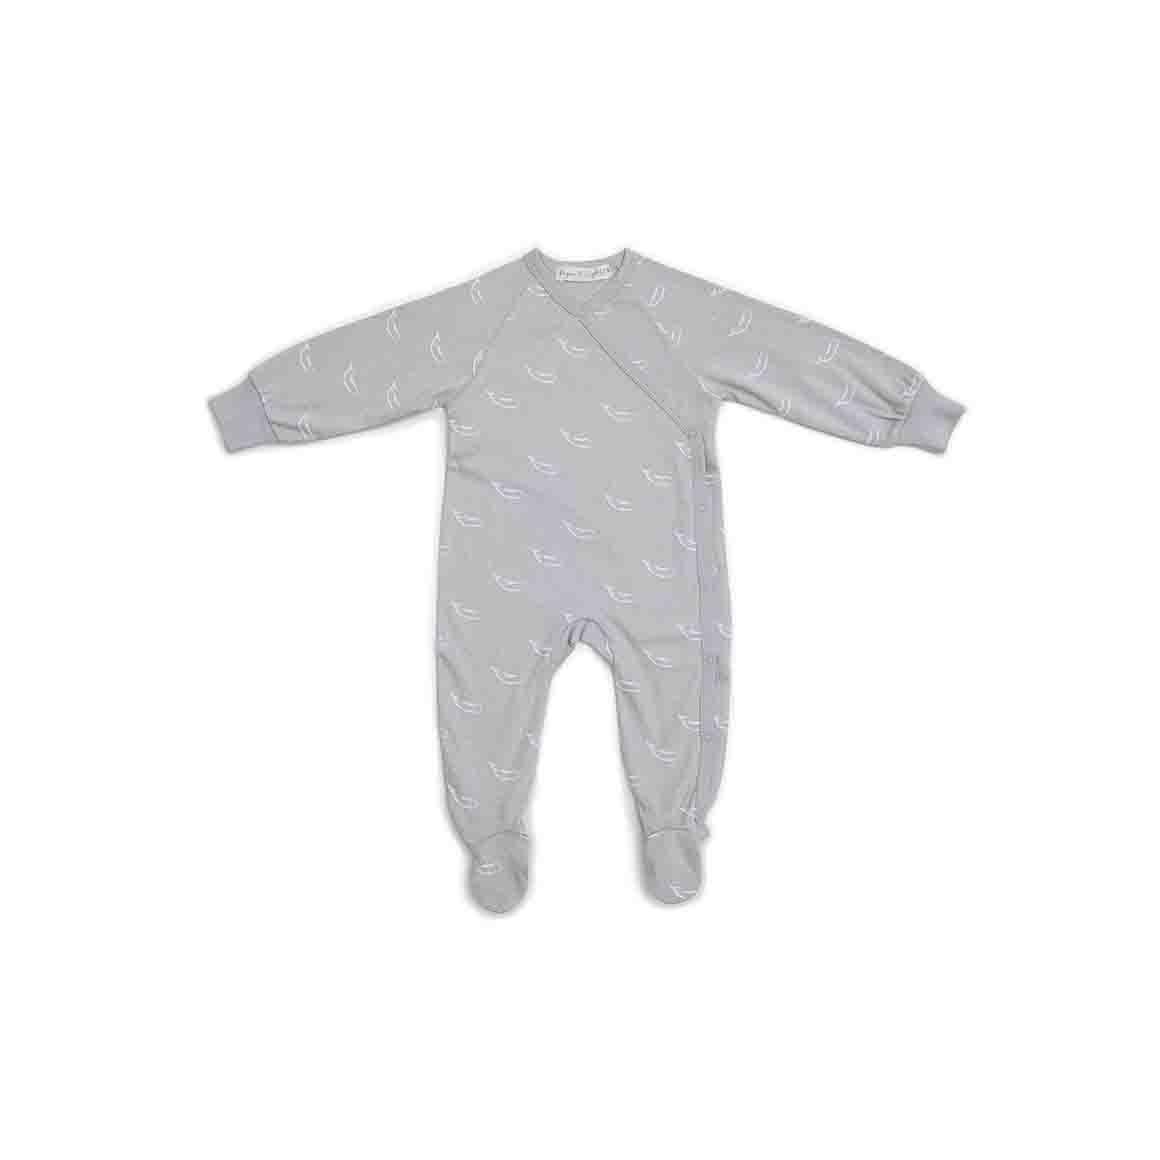 Baby Sleepsuit Kimono With Feet (Soft Stone Grey - Tiny Whales Print)   Trada Marketplace